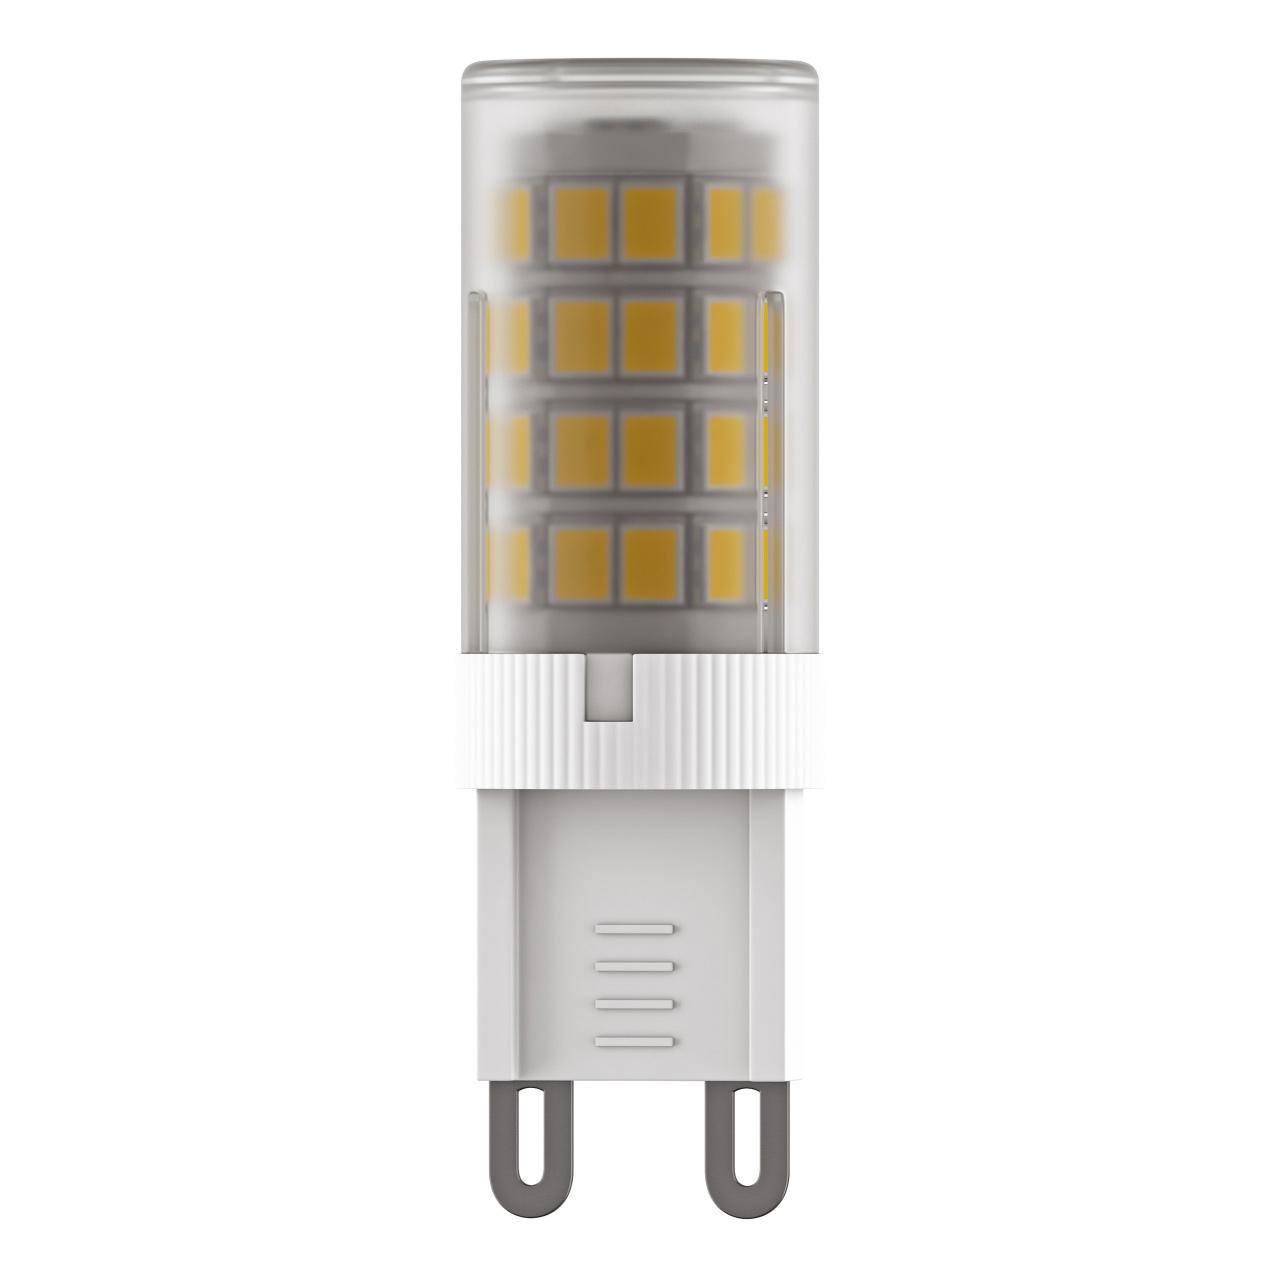 Лампа LED 220V JC G9 6W=60W 492LM 360G FR 3000K 20000H Lightstar 940462